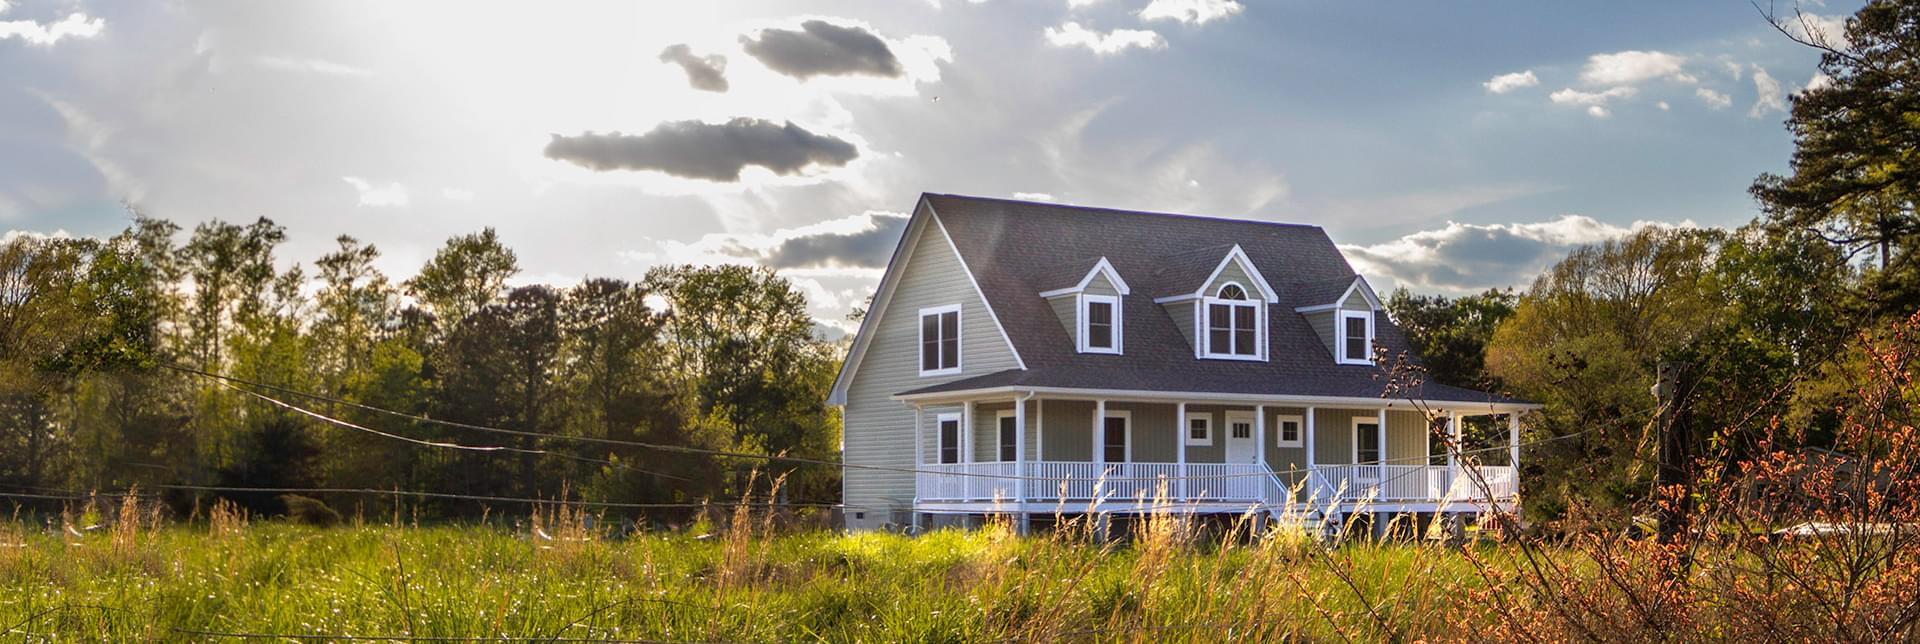 New Homes in Falls Church VA